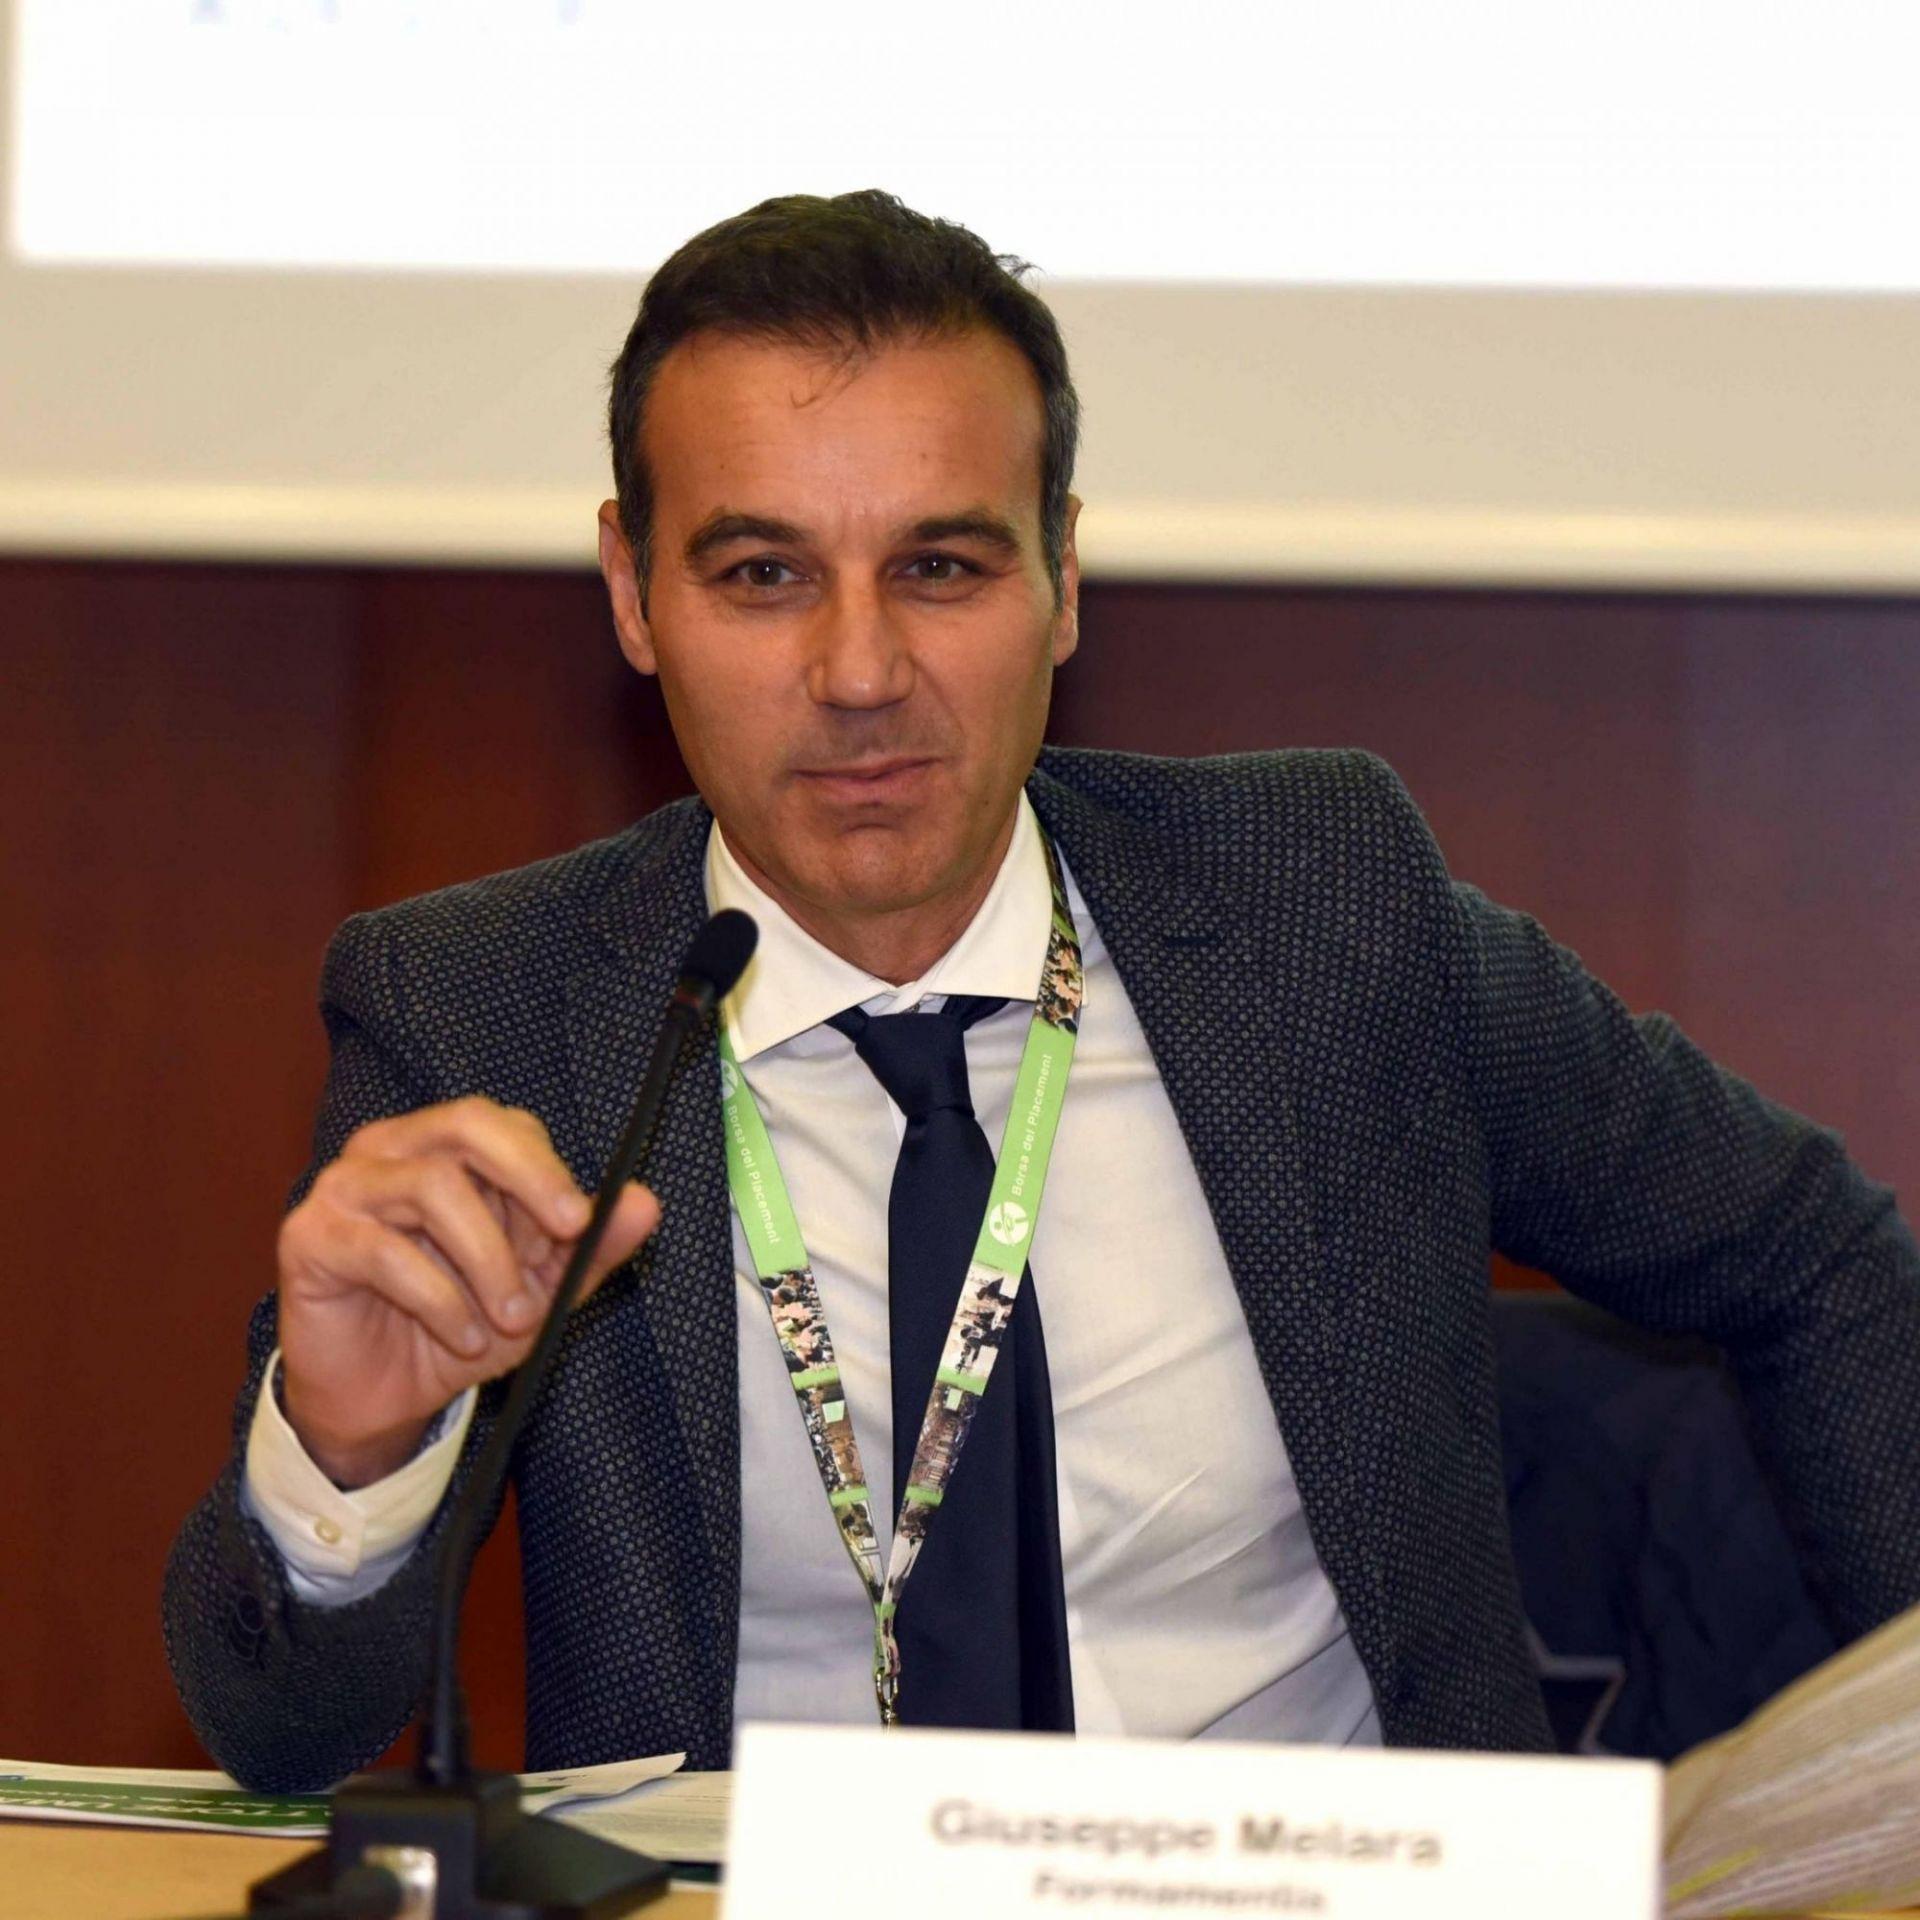 Giuseppe Melara